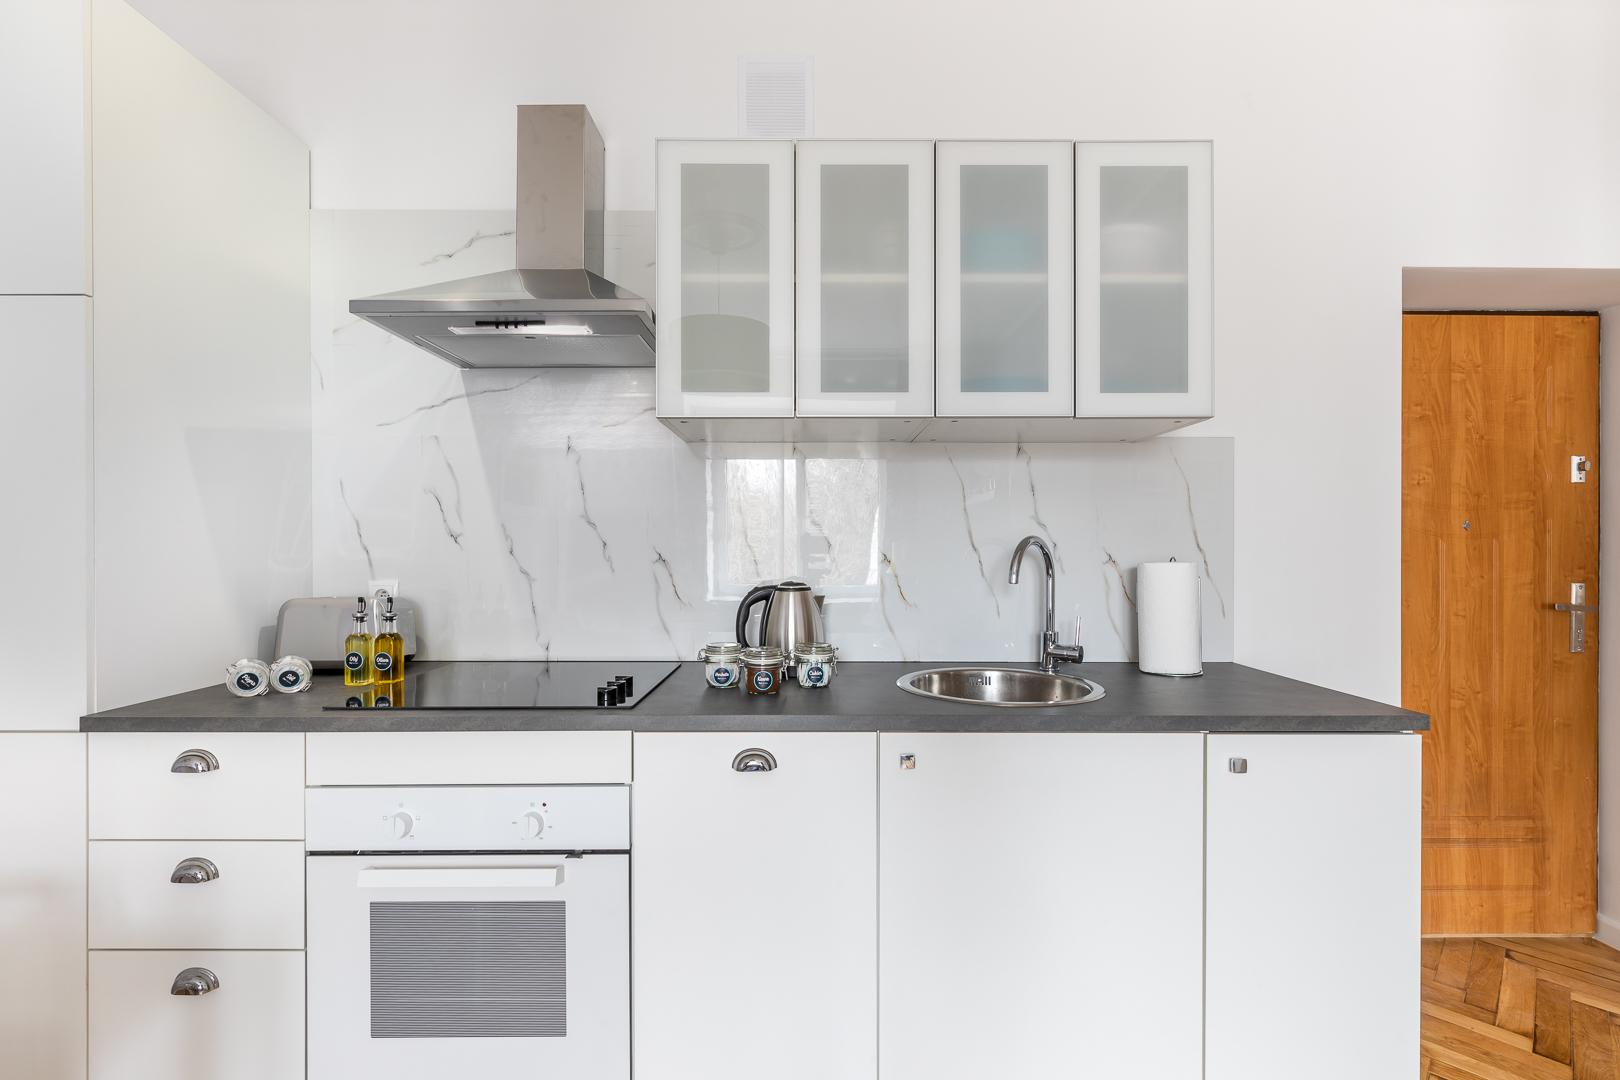 Kitchen at Franciszkaska 10 Apartment